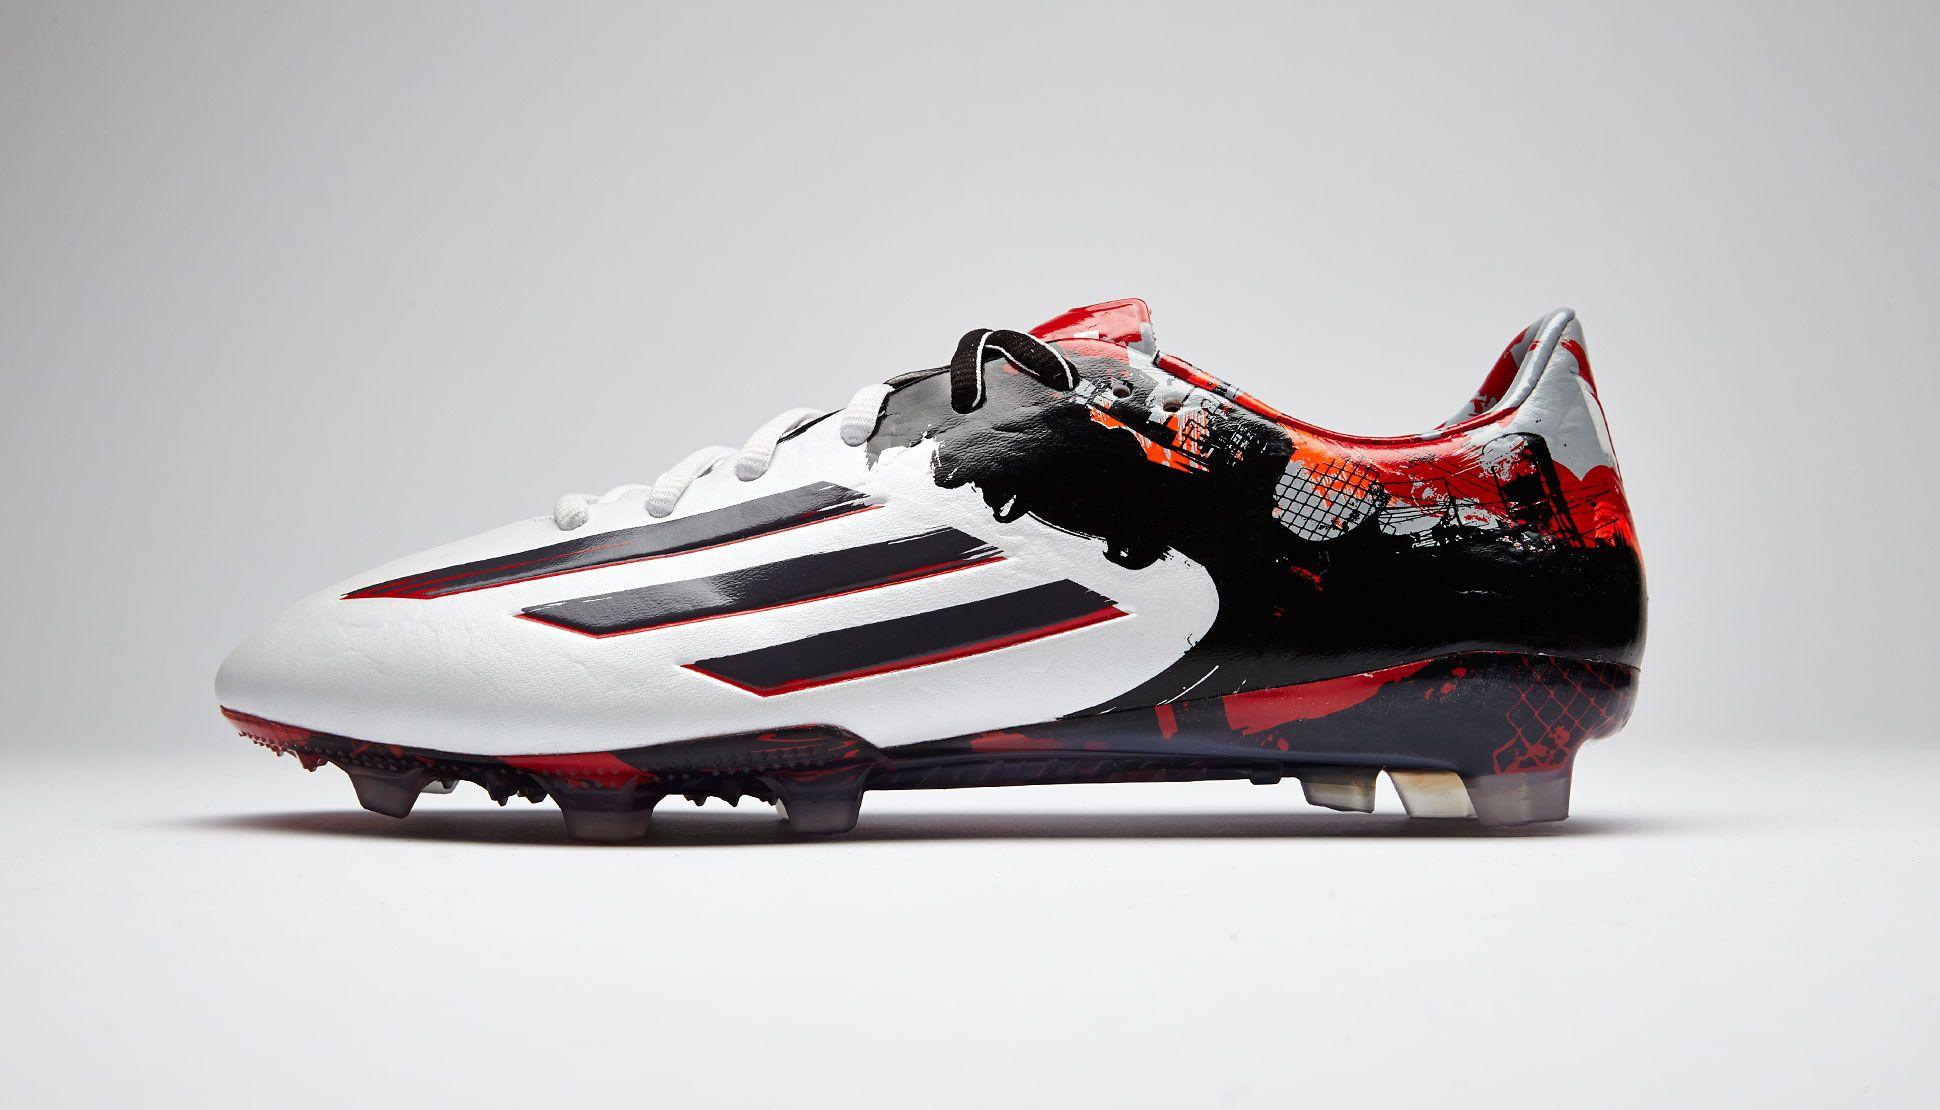 adidas f50 messi boots